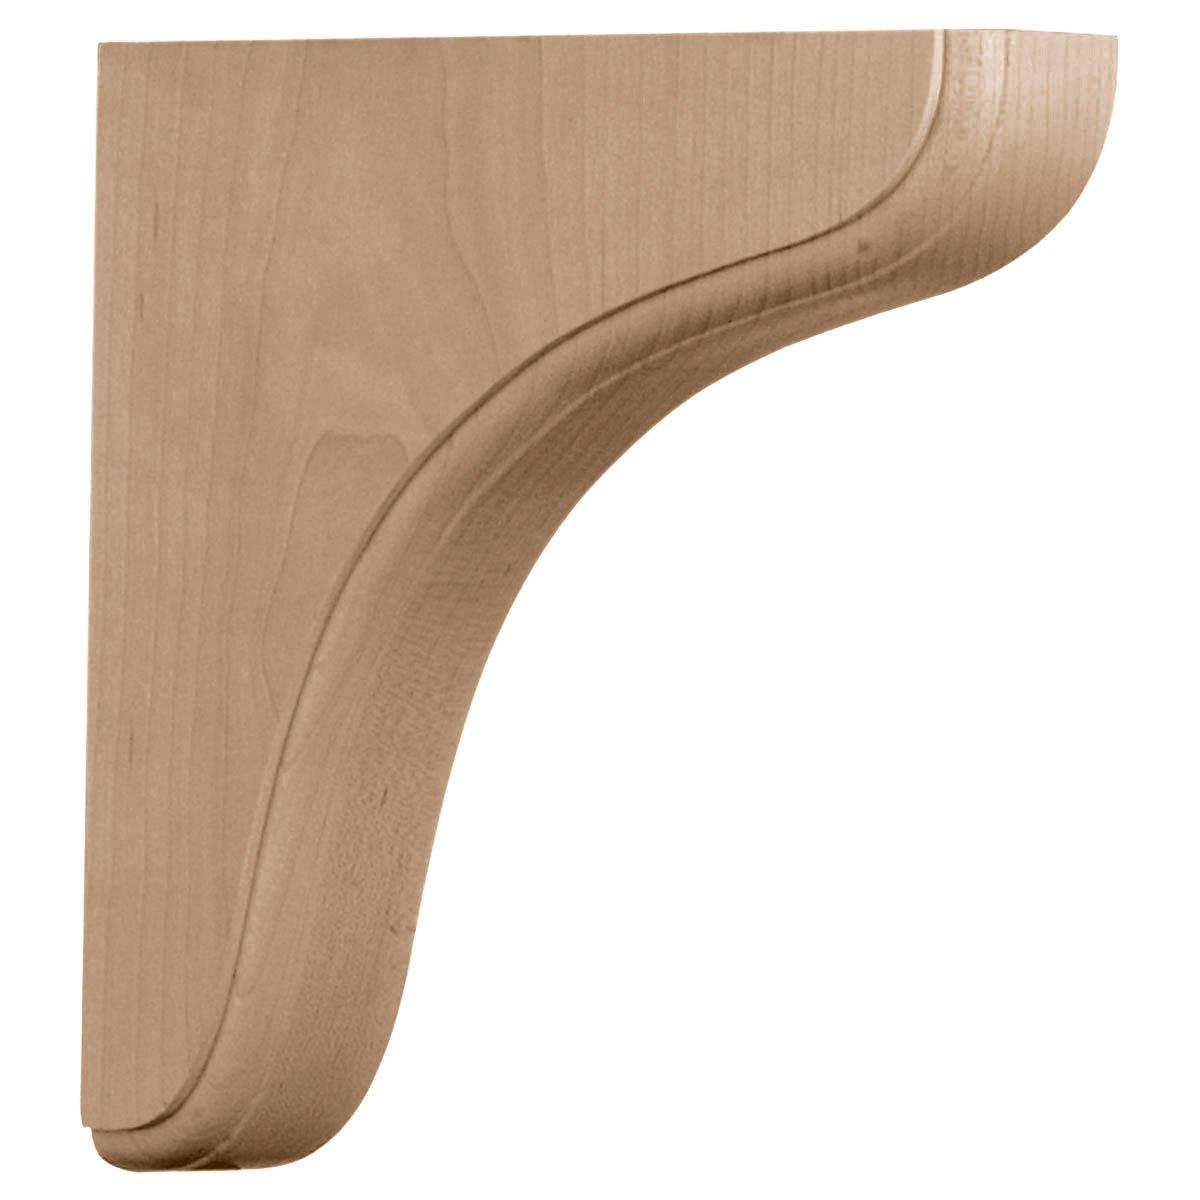 Ekena Millwork BKTW02X08X08EARO-CASE-2 1 3/4 inch W x 7 1/2 inch D x 7 1/2 inch H Eaton Wood Bracket, Red Oak (2-Pack), by Ekena Millwork